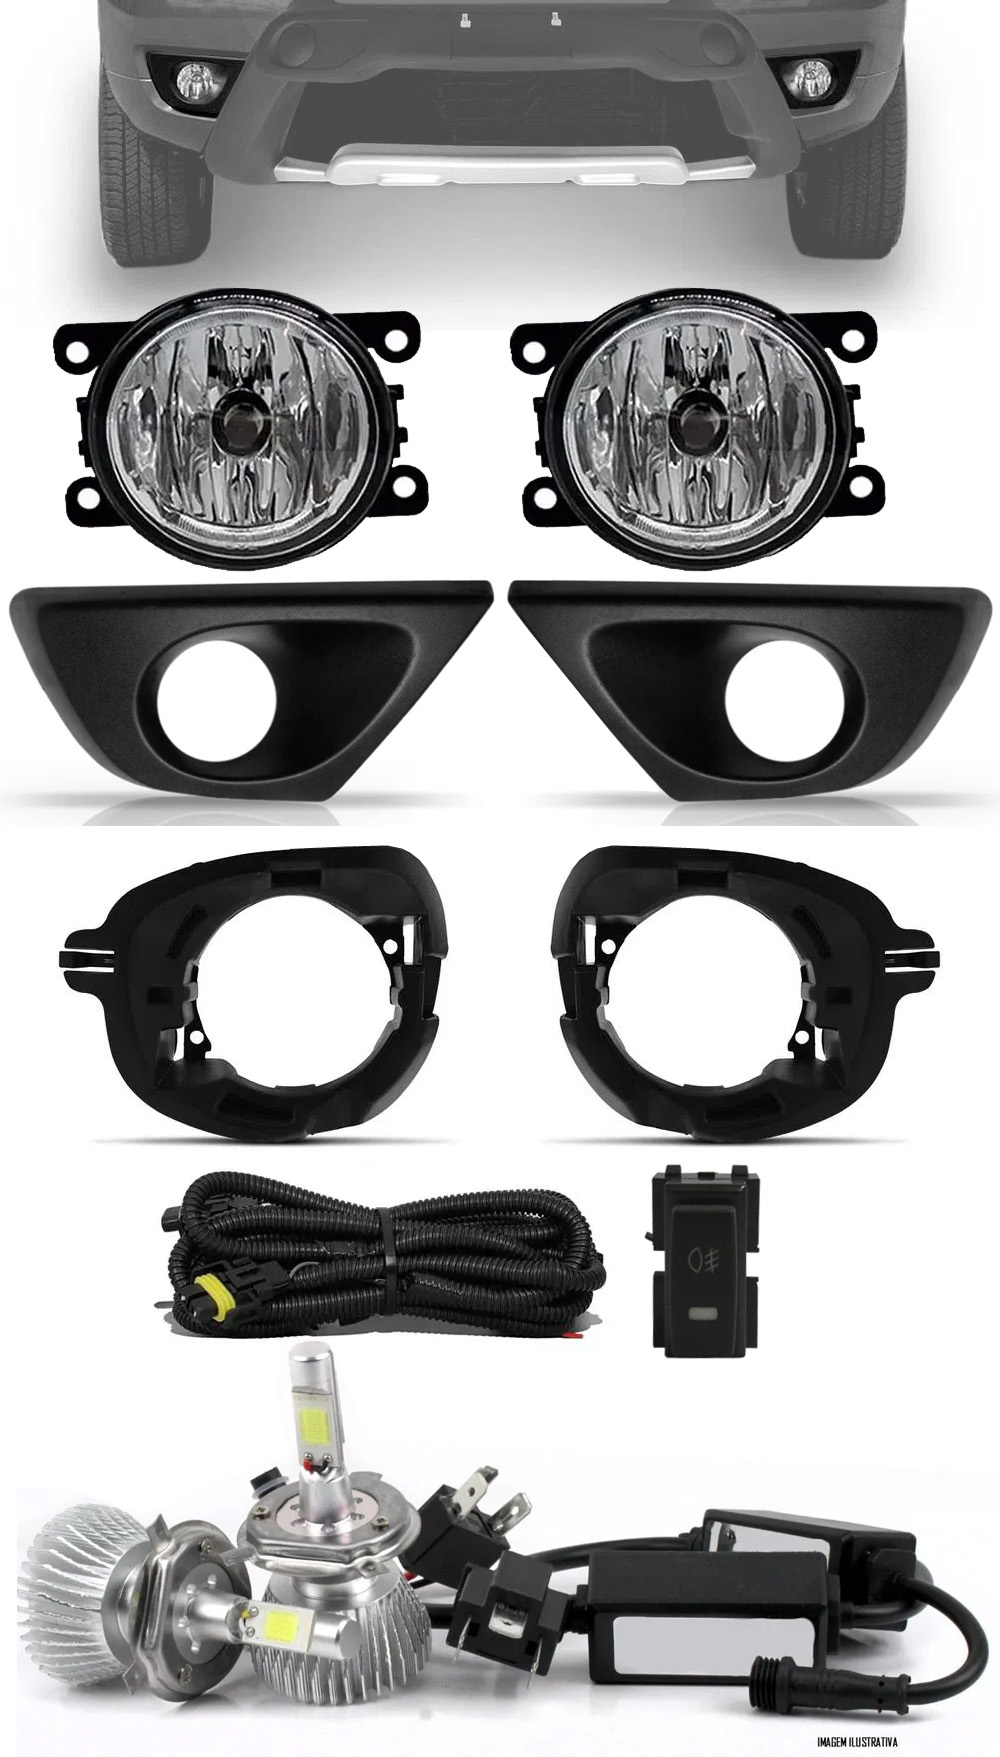 Kit Farol de Milha  Renault Duster 2015 á 2019 + Moldura e Base Para Fixação - Botão Painel + Kit Lâmpada Super LED 6000K